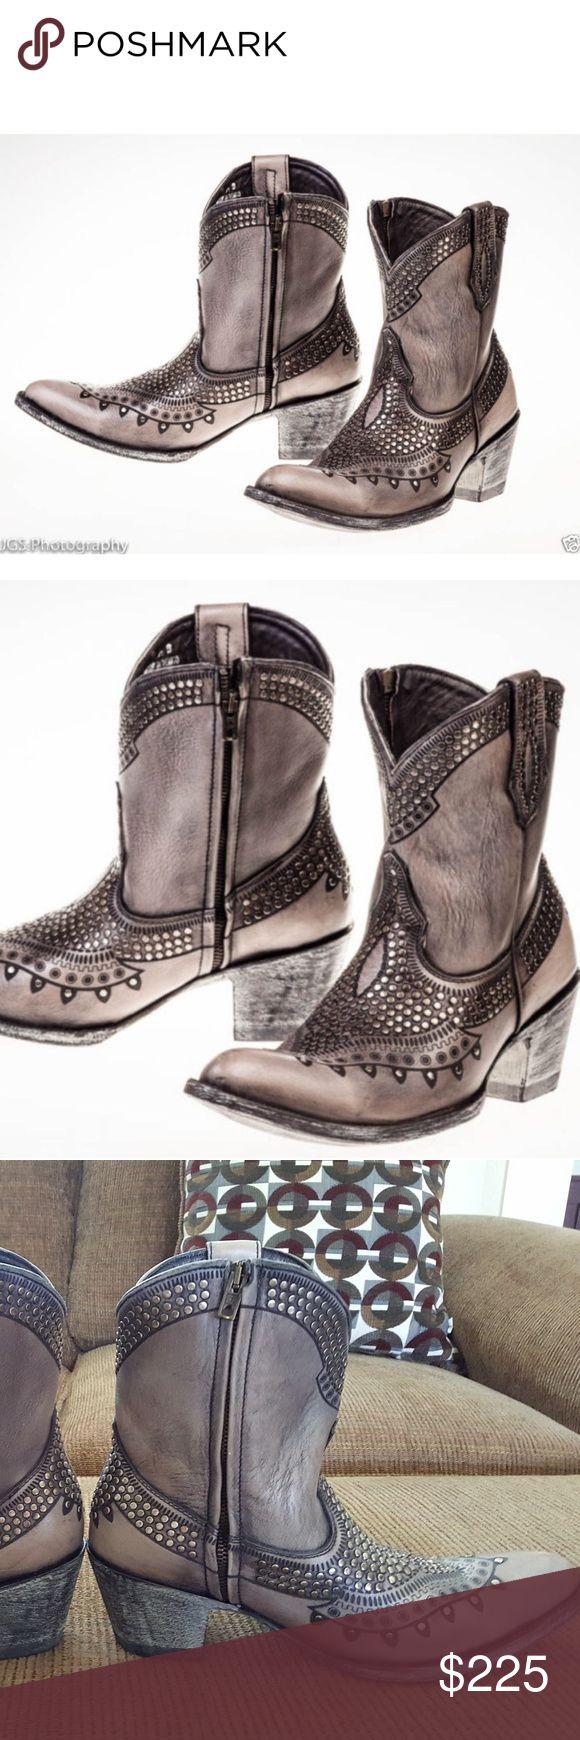 "Old Gringo Killer Zipper, Size 9.5 Old Gringo Killer Zipper, Size 9.5, 8"" shaft, Trigger Grey Sintino heel and toe Old Gringo Shoes Heeled Boots"